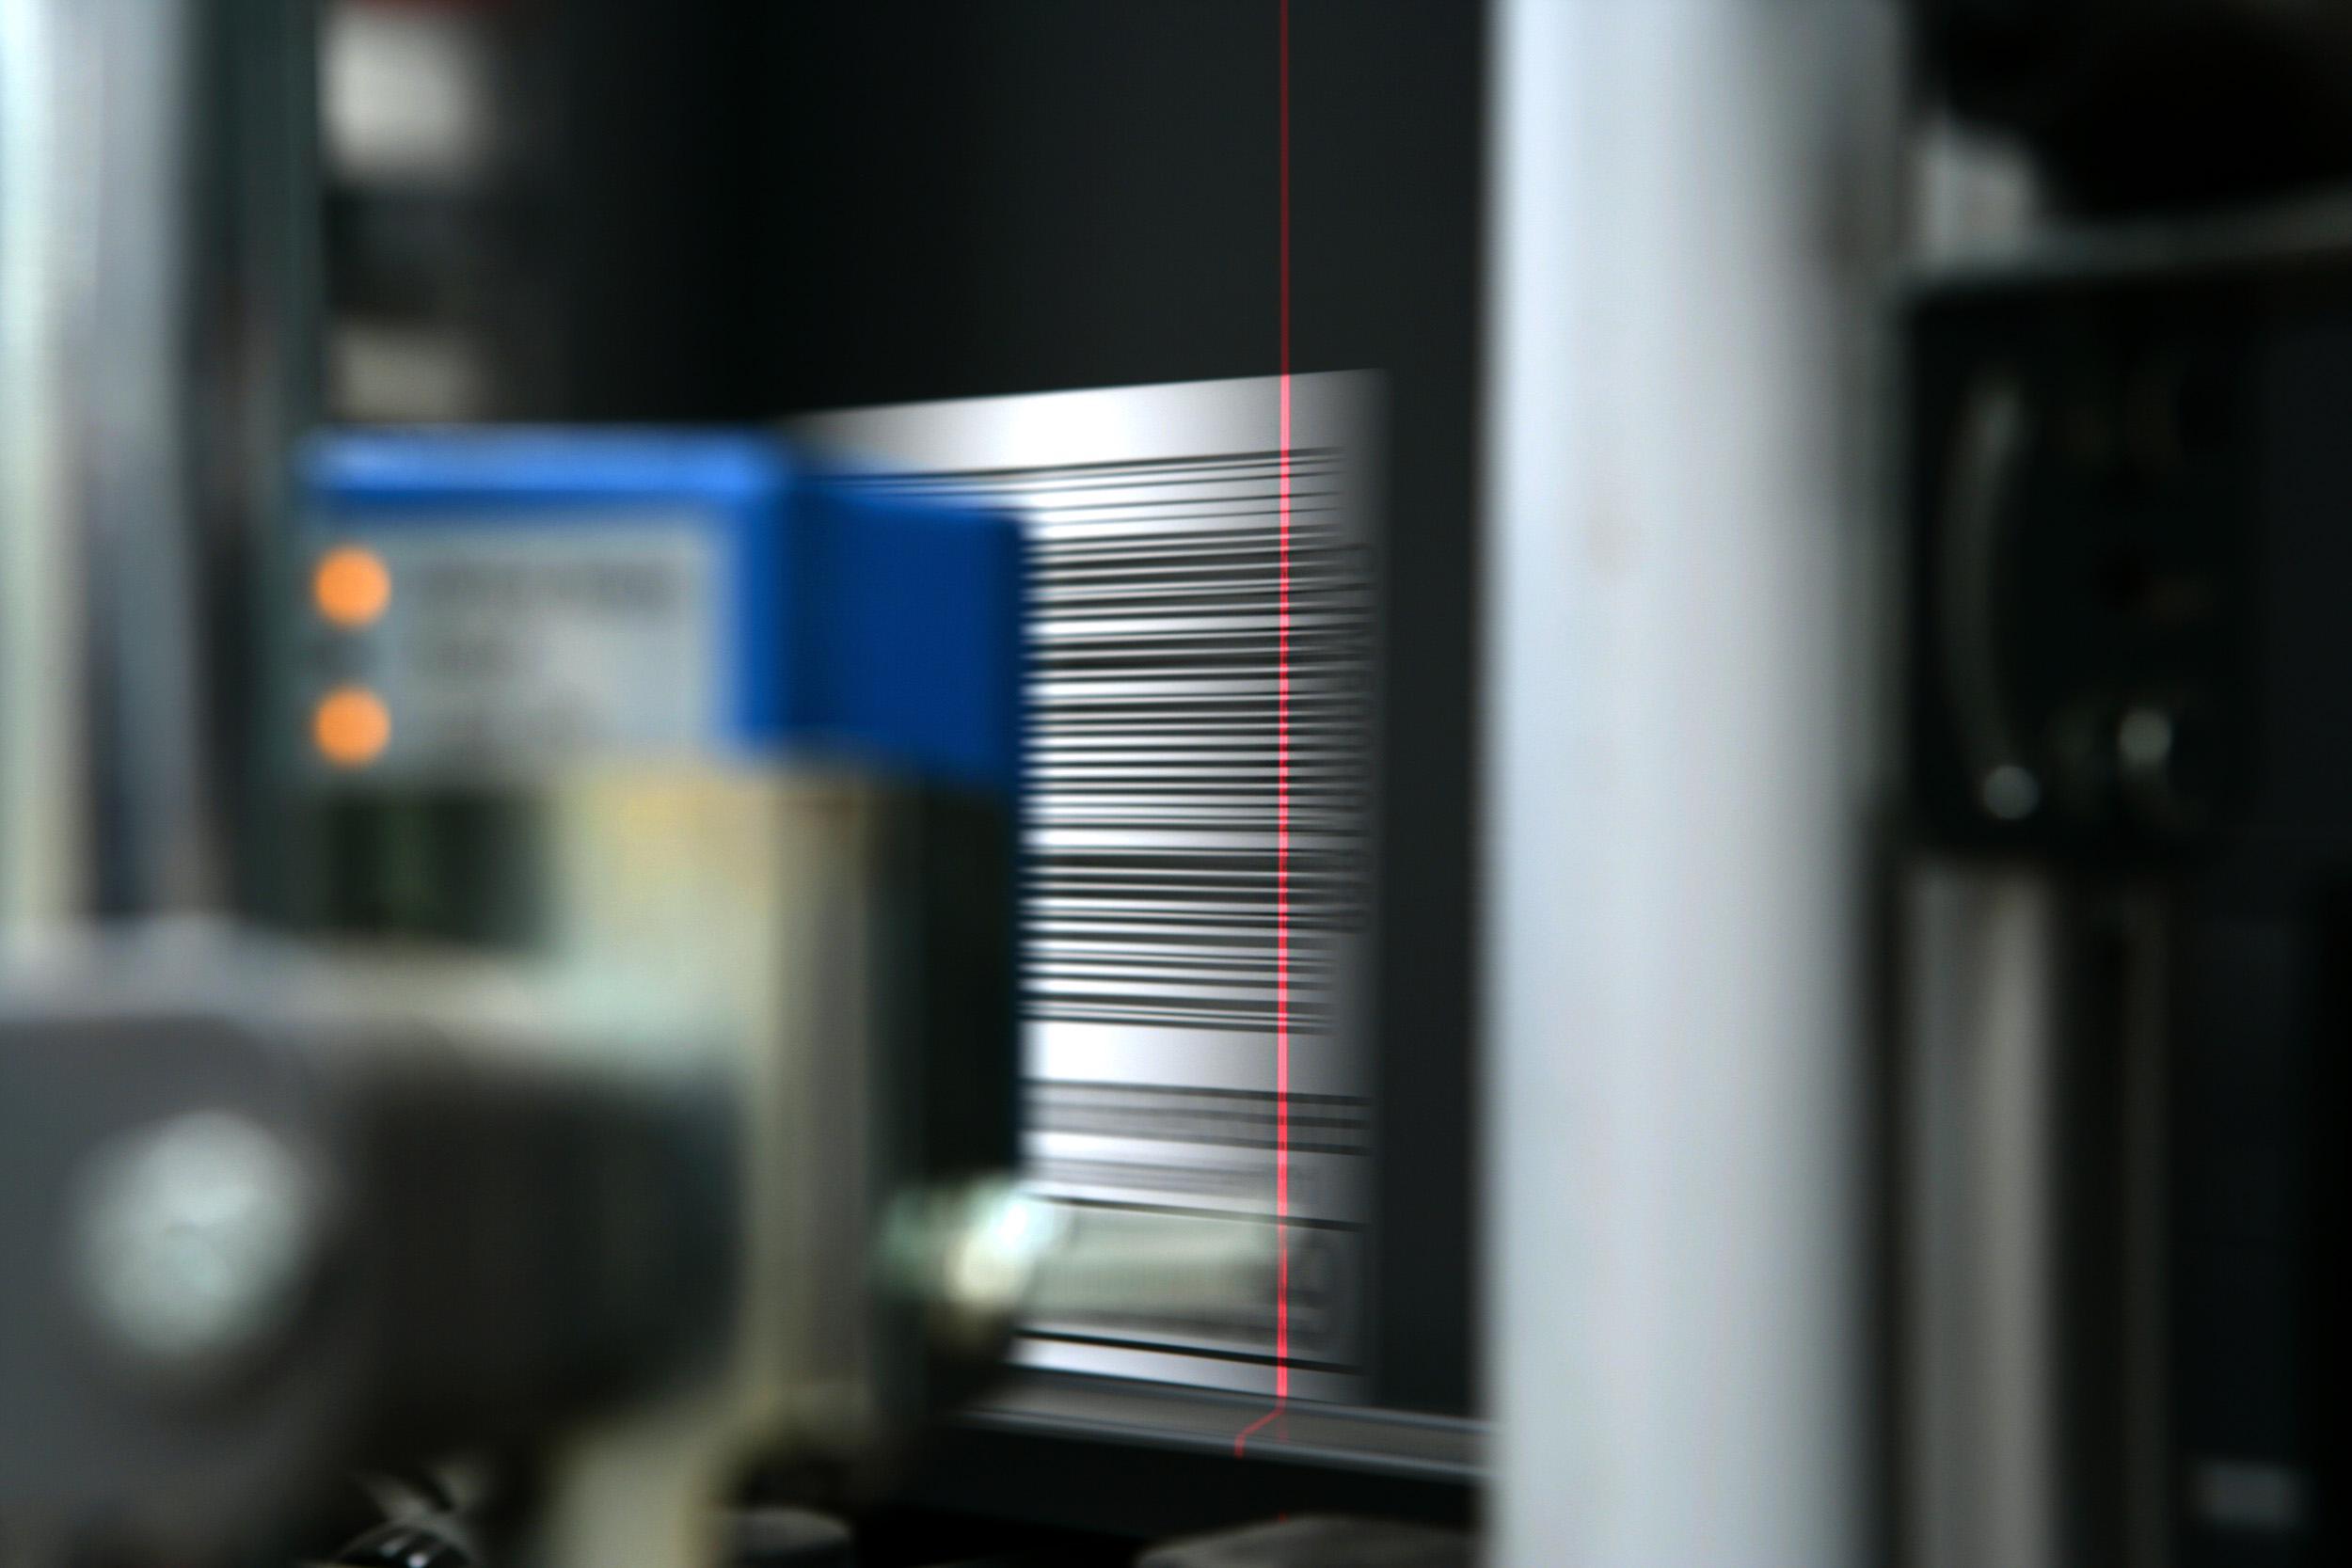 Automation_05.JPG